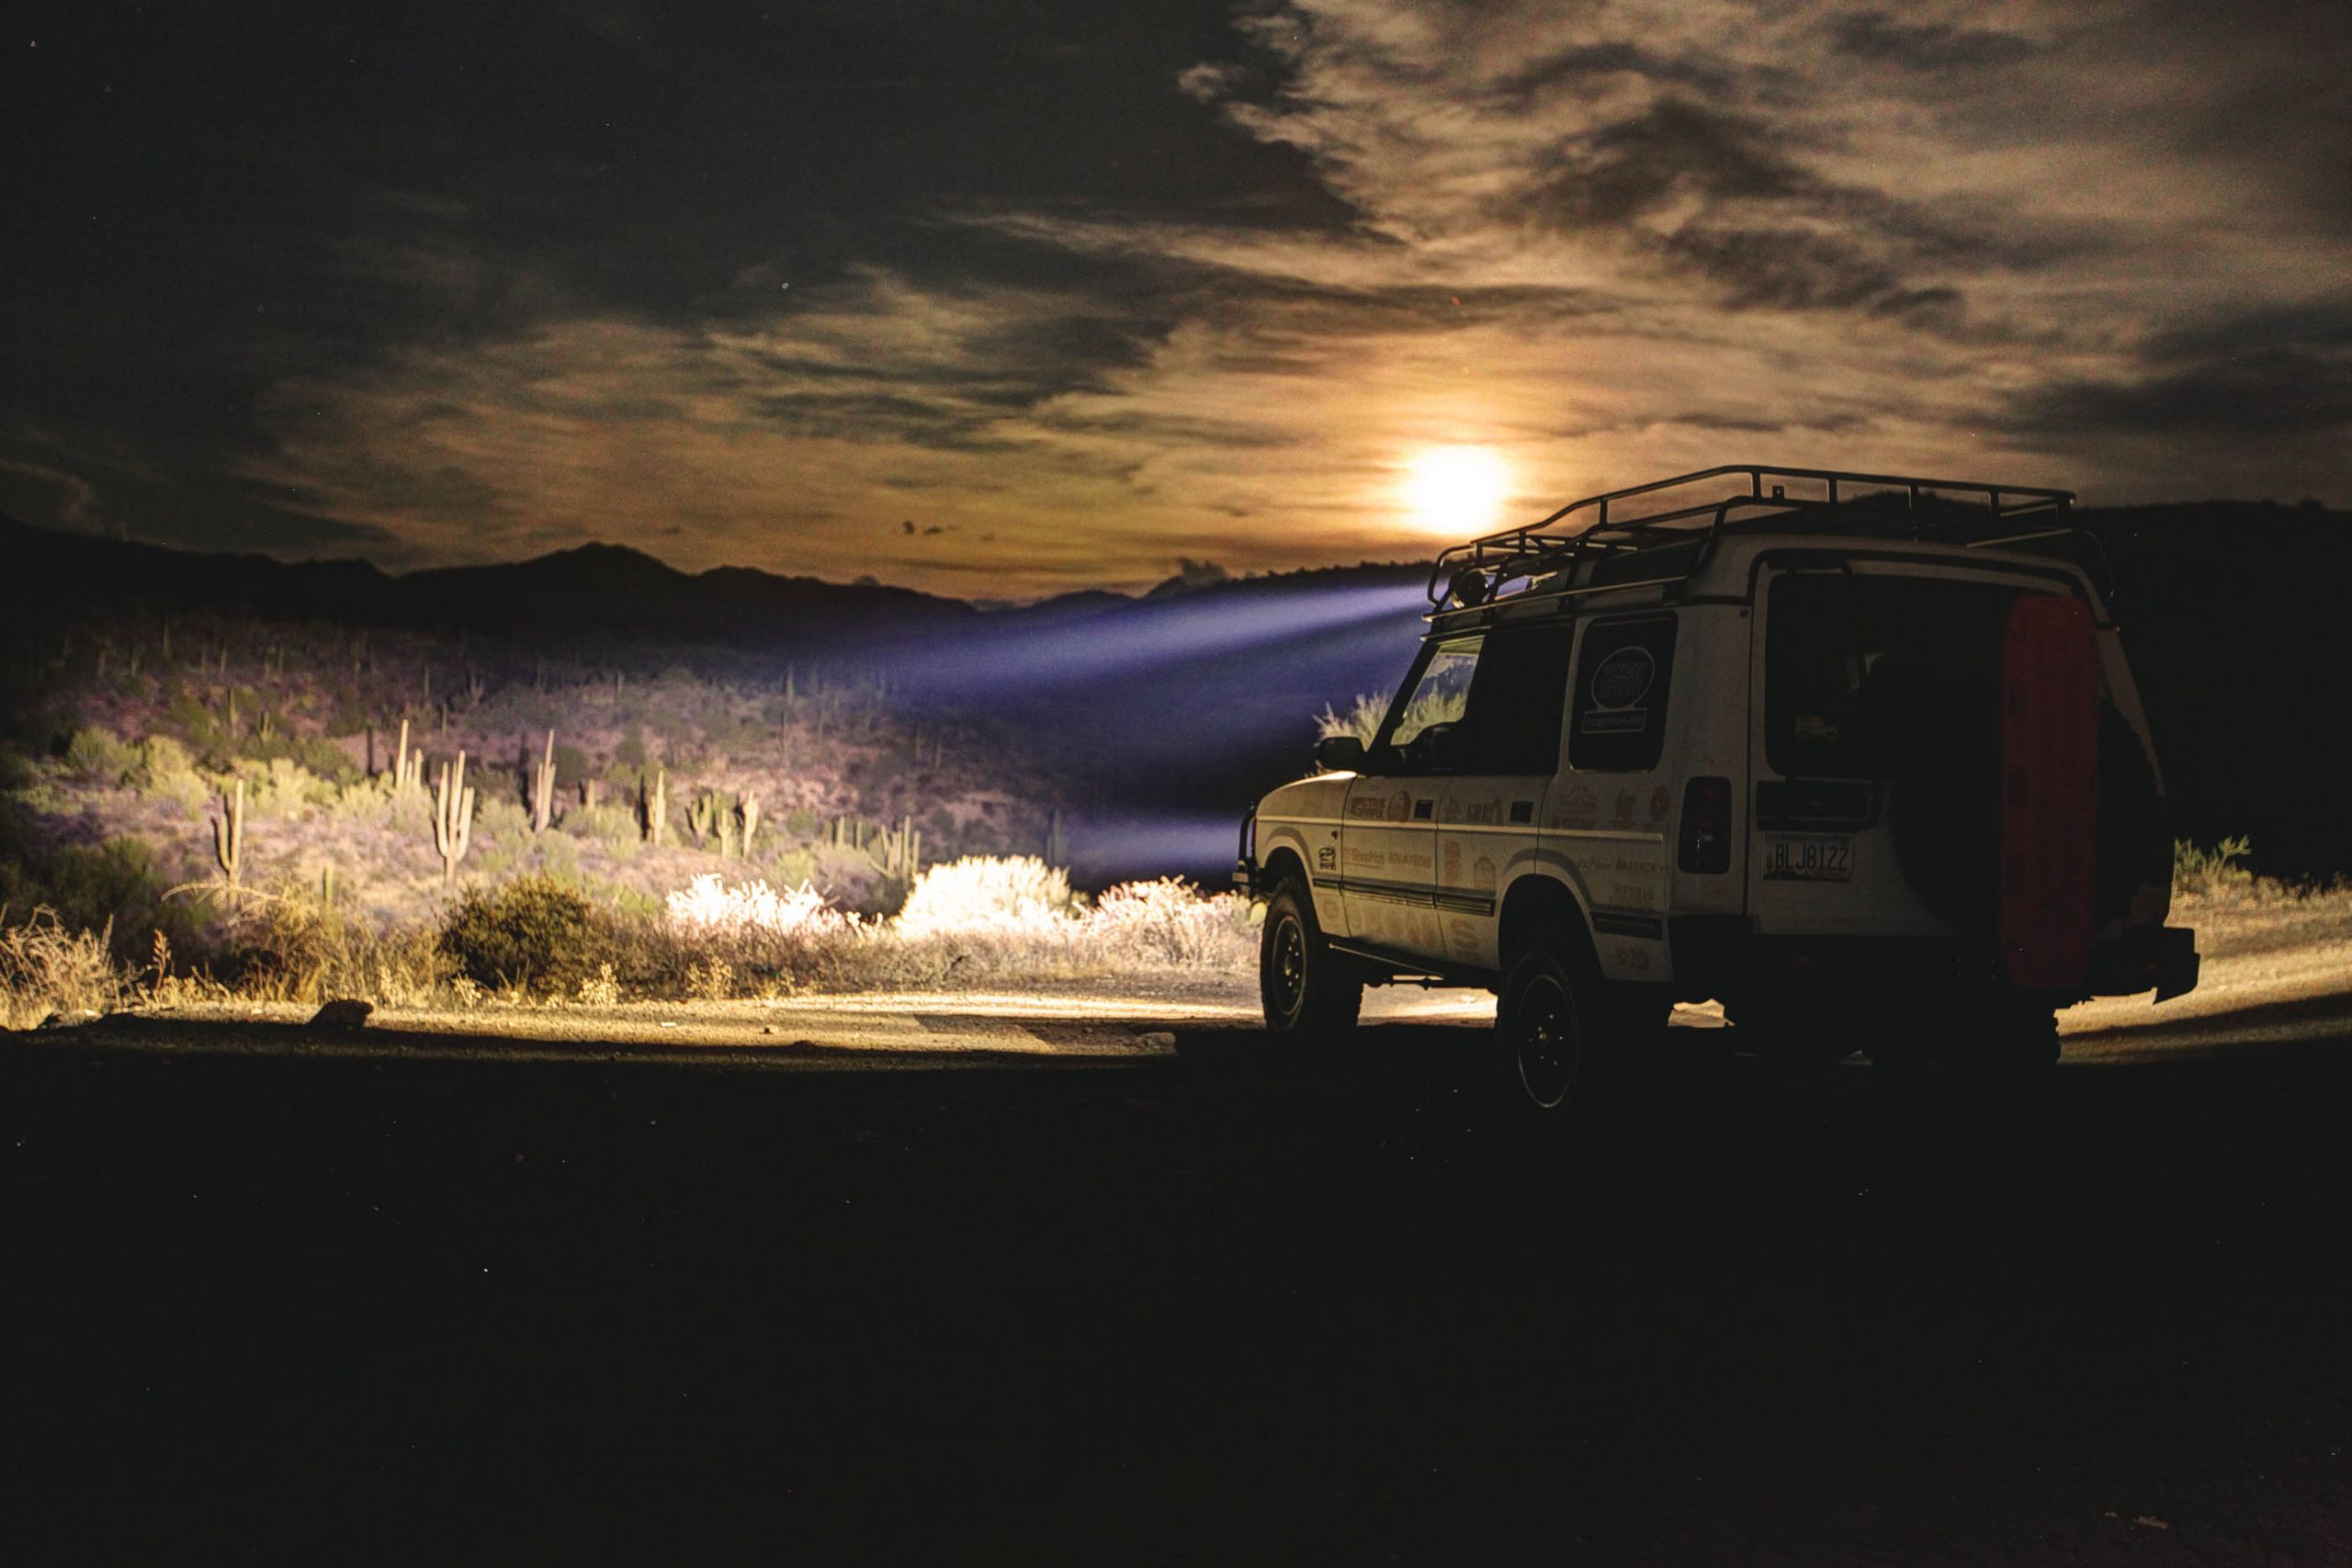 Custom Off Road / Overlanding Land Rover Build - Image #04